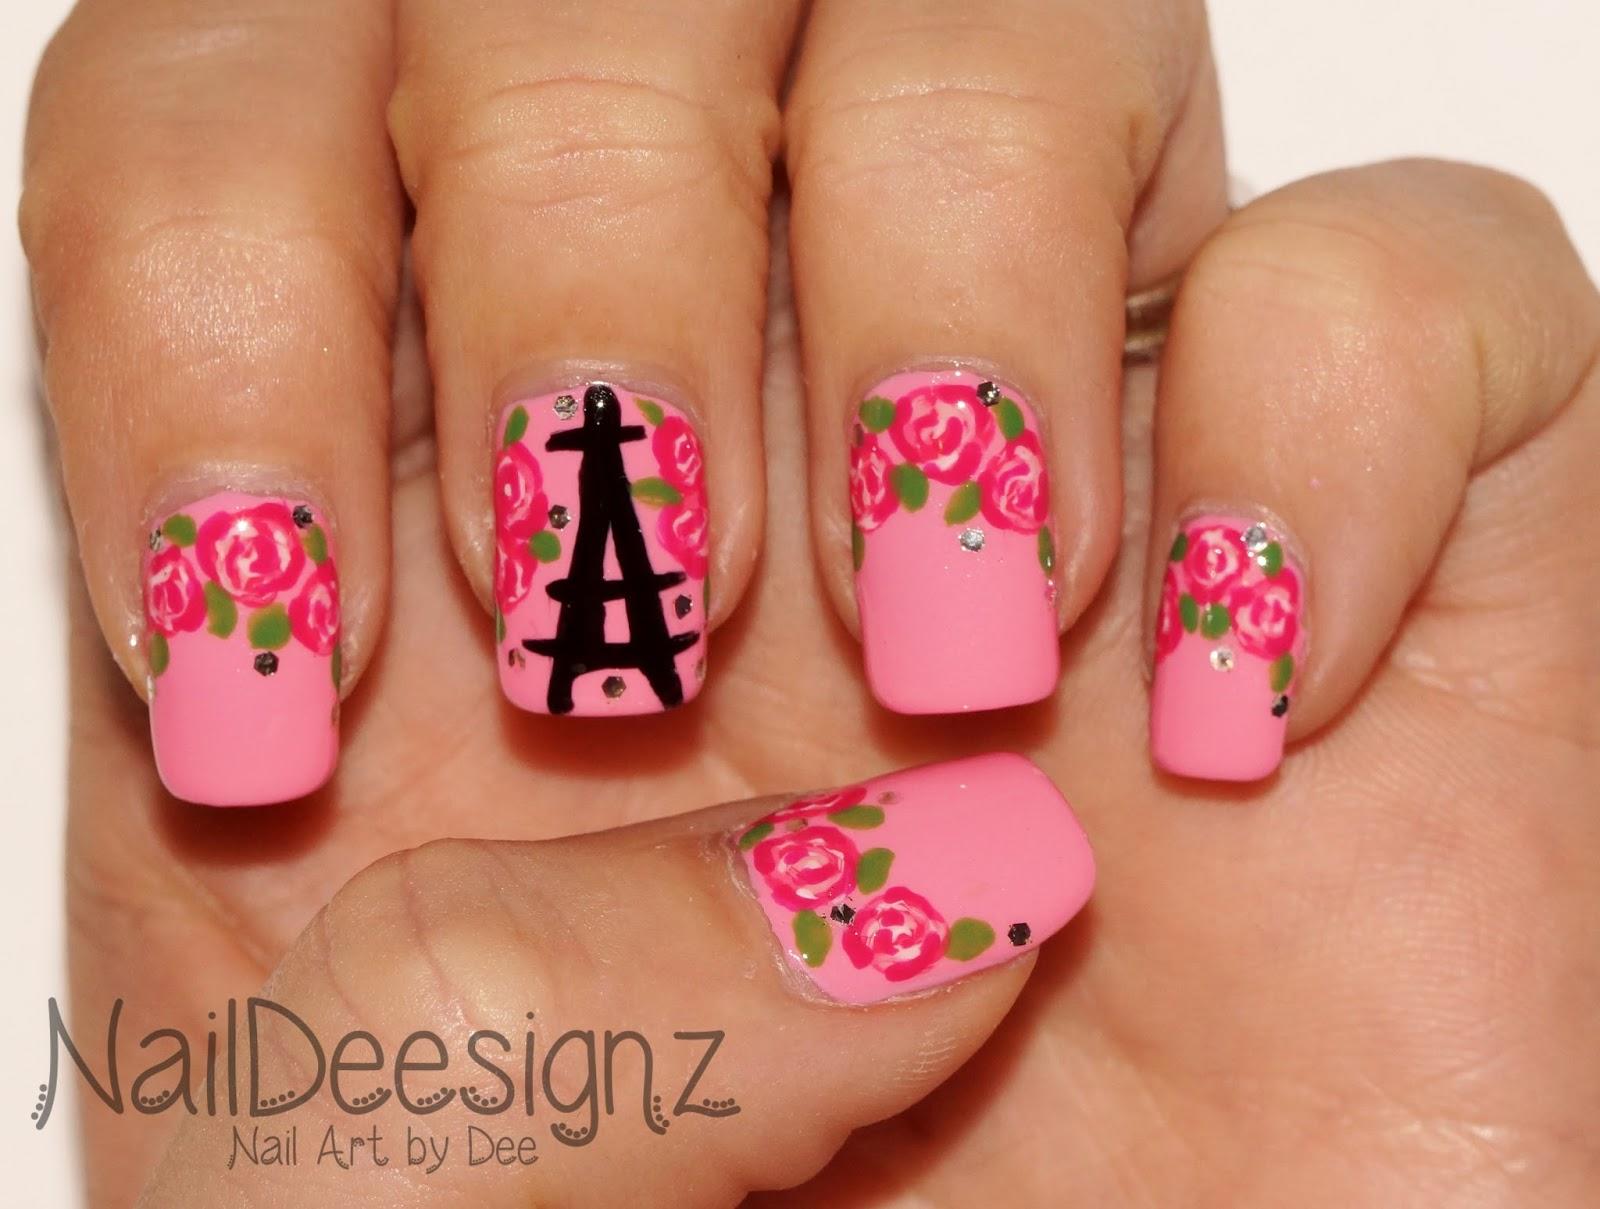 NailDeesignz: Parisian Nail Art